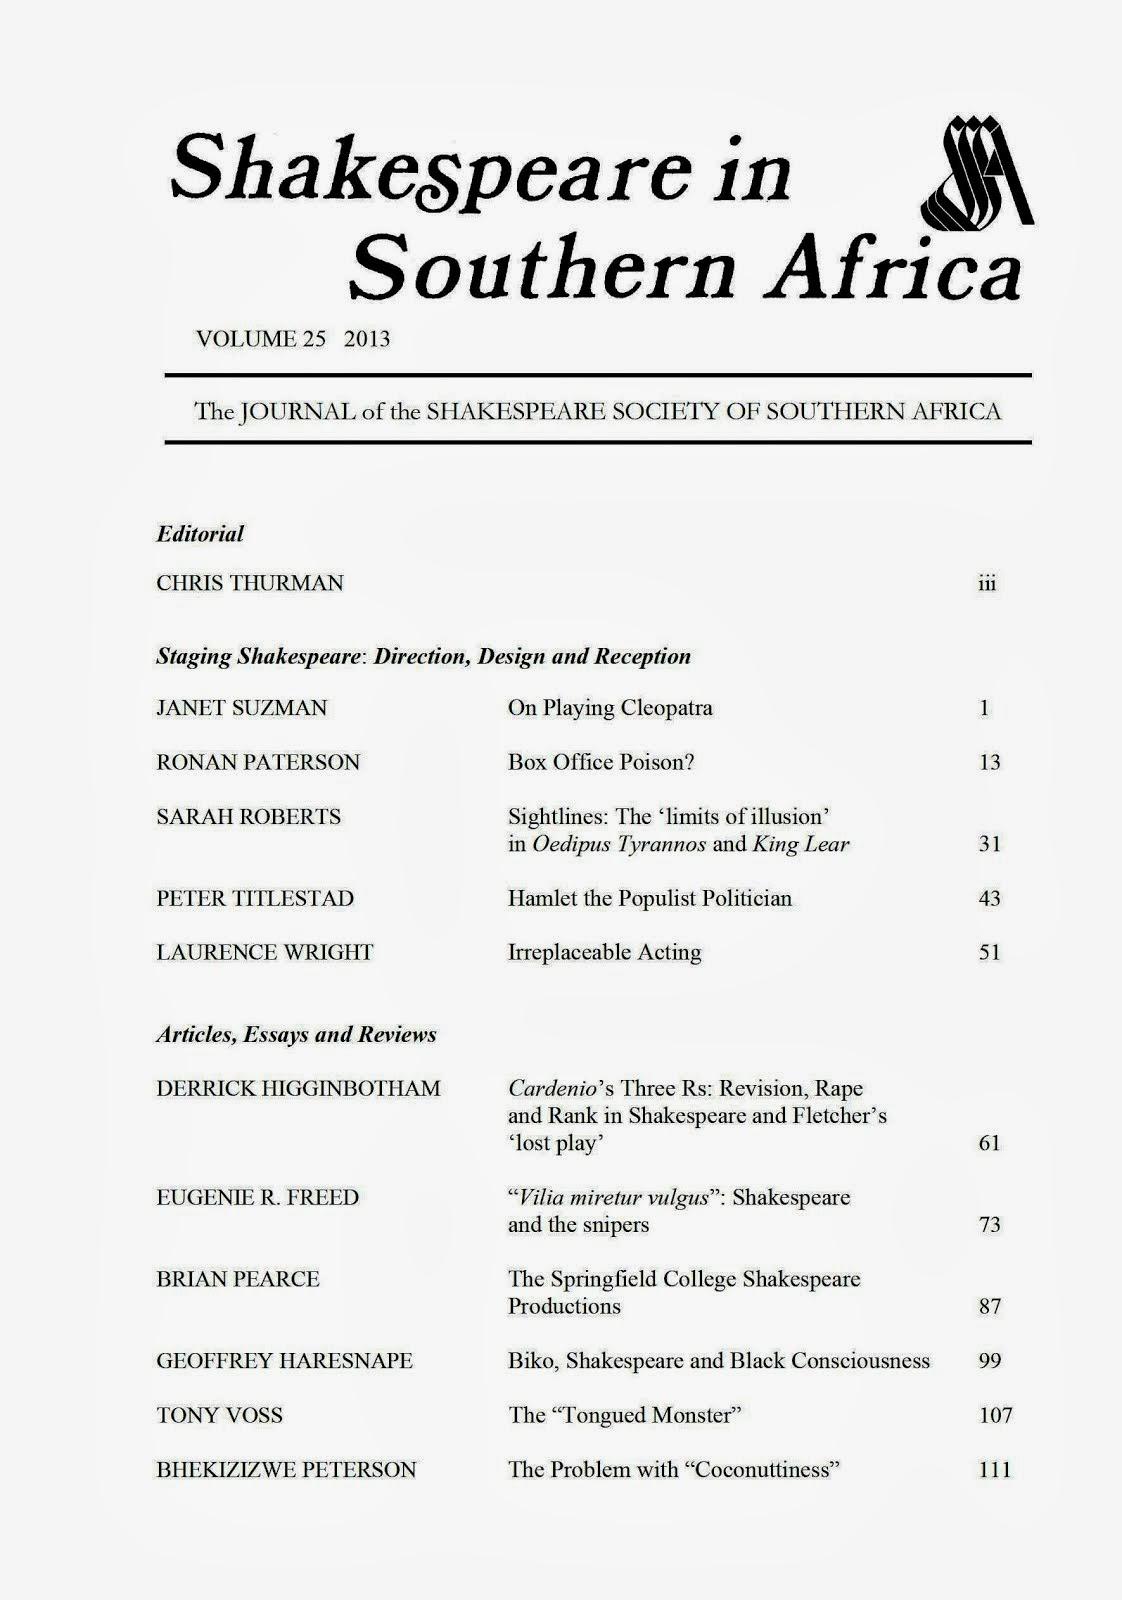 Volume 25, 2013